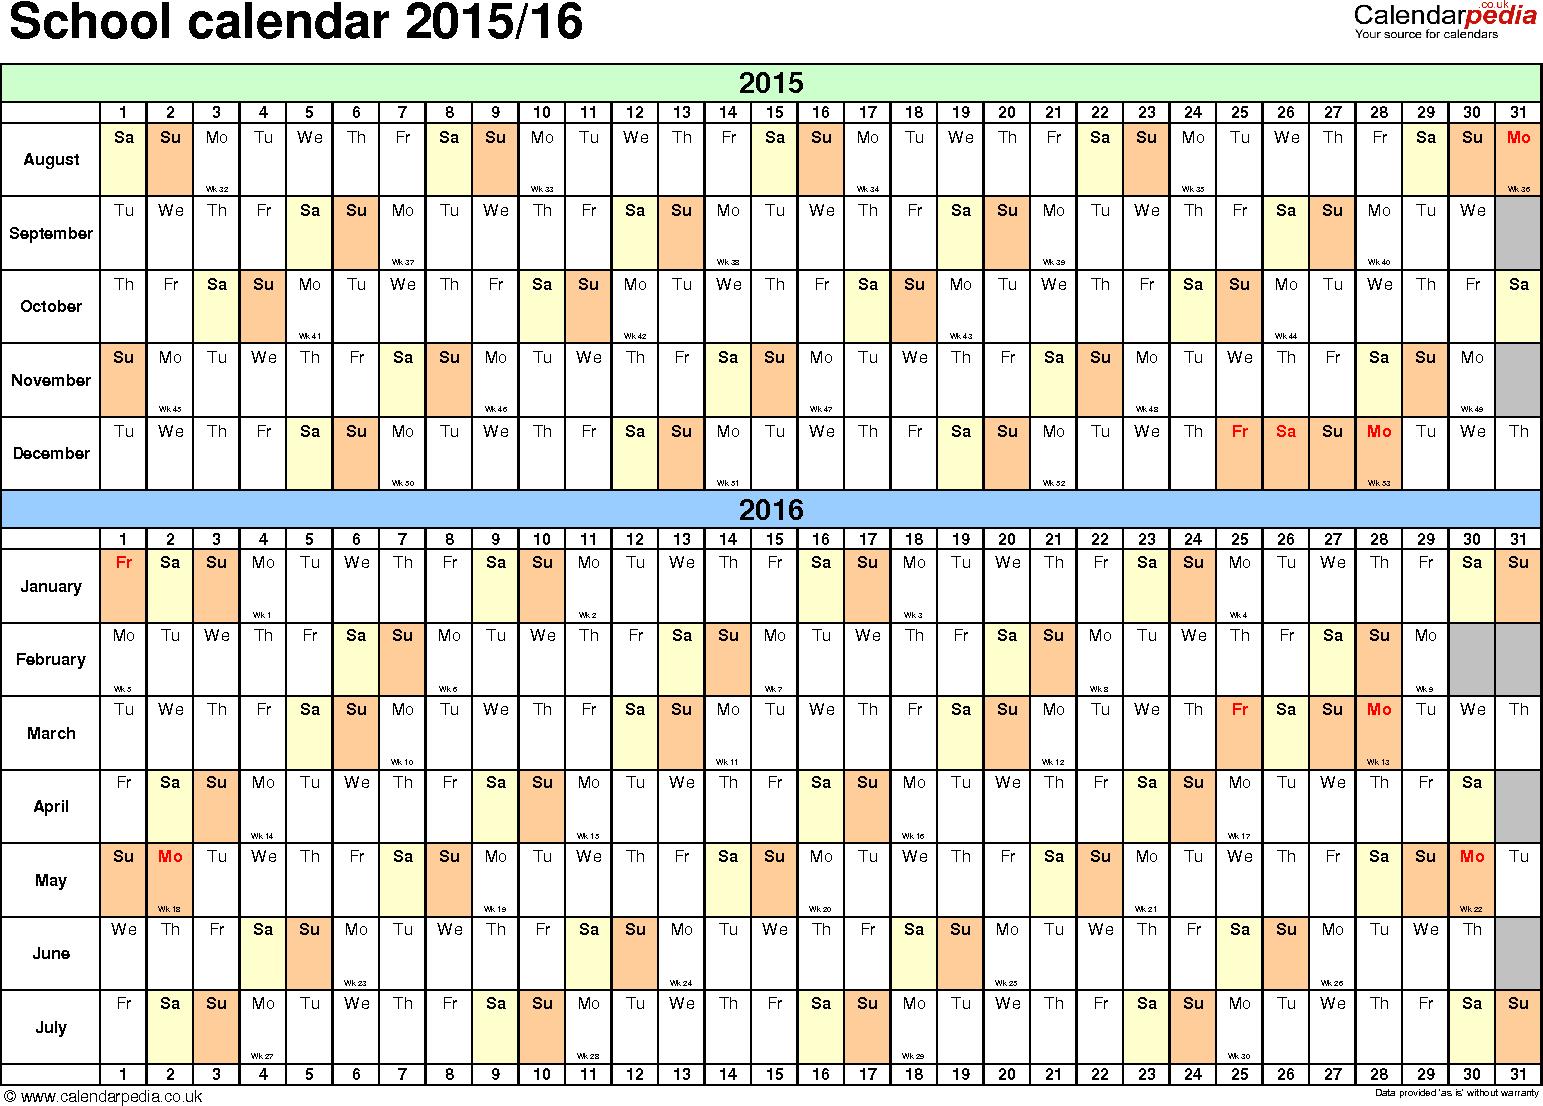 calendar template 2015 16